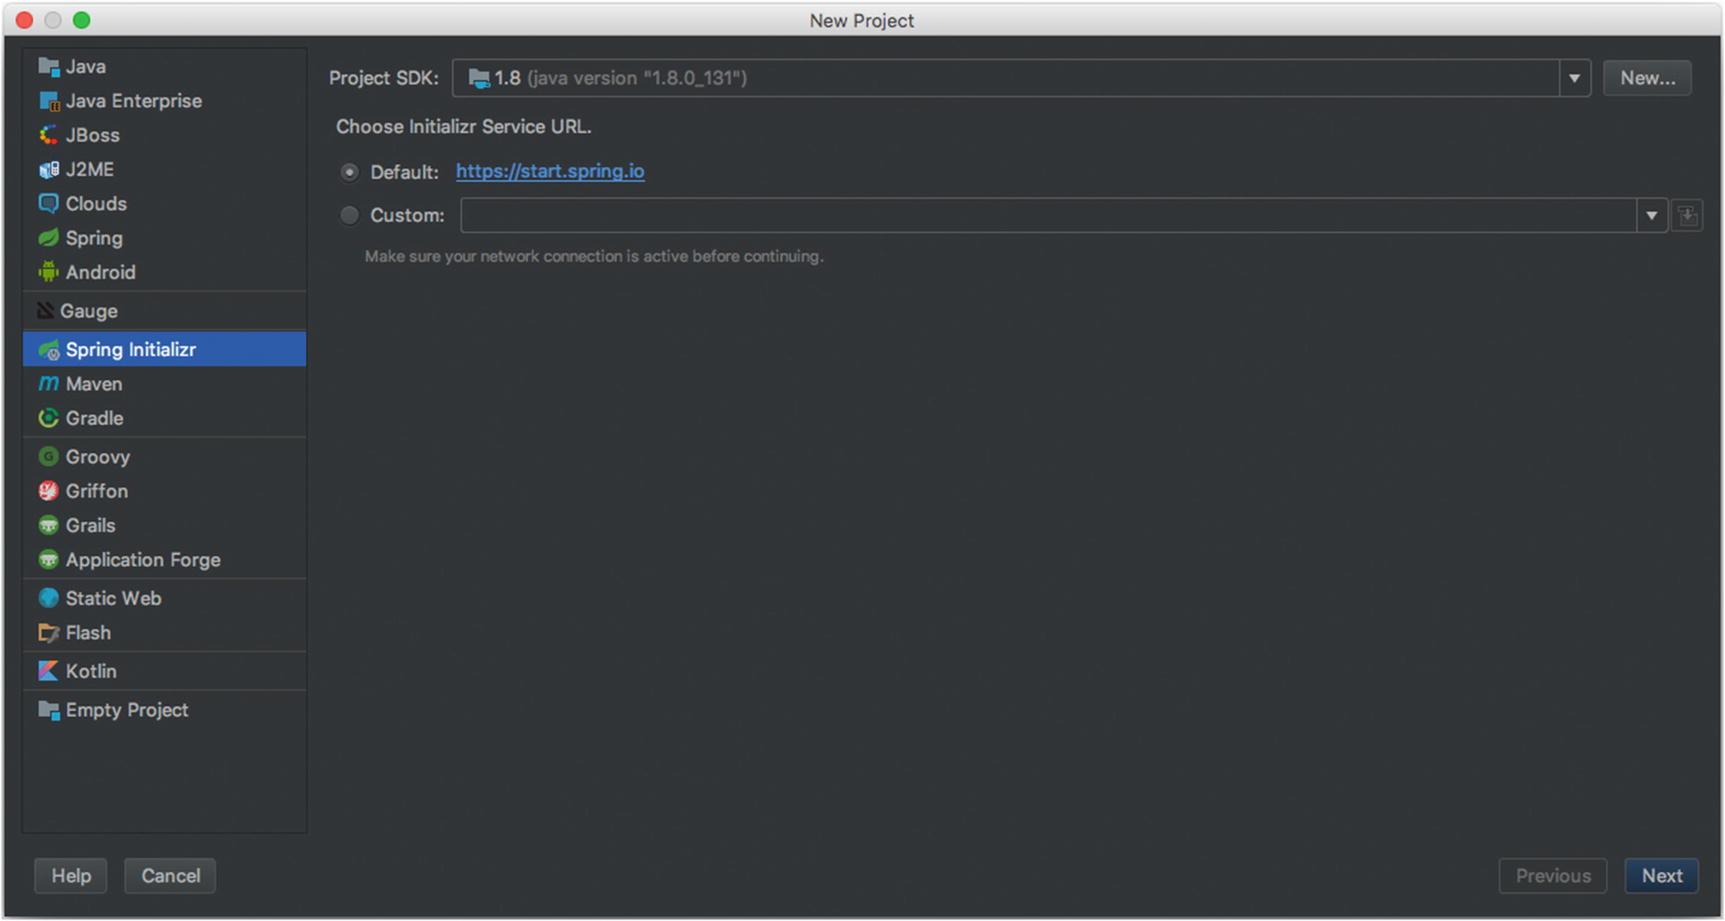 Java 8 Update 131